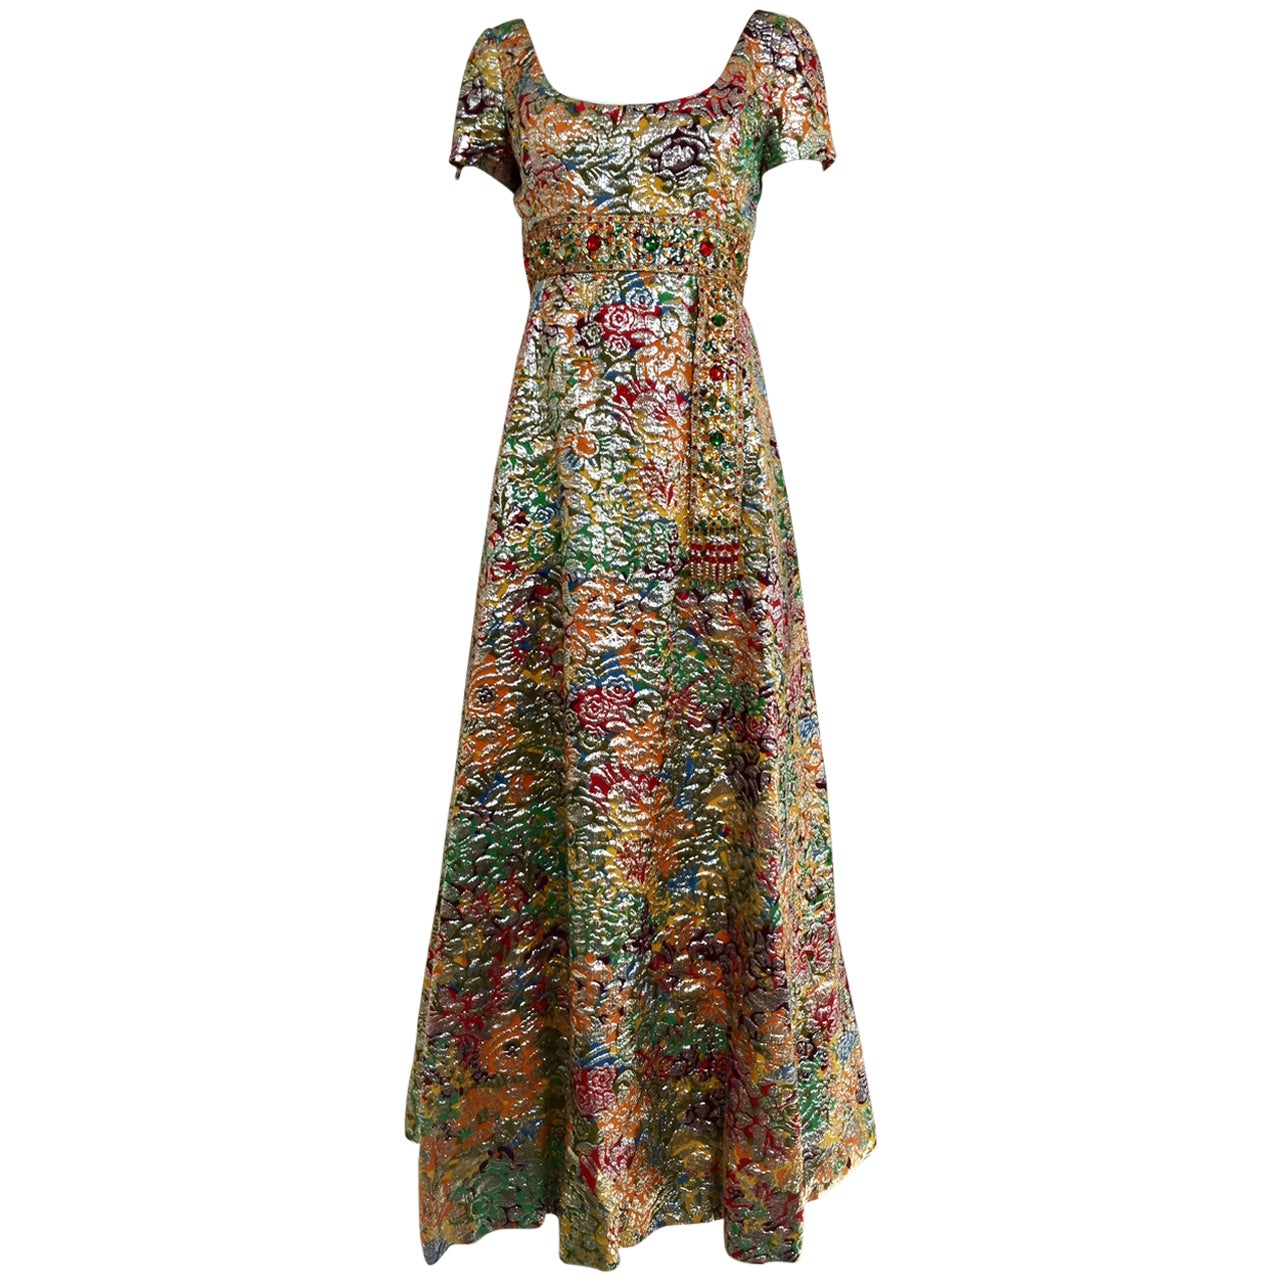 1960s Multi Color Metallic Silk Brocade Dress with Embellishment